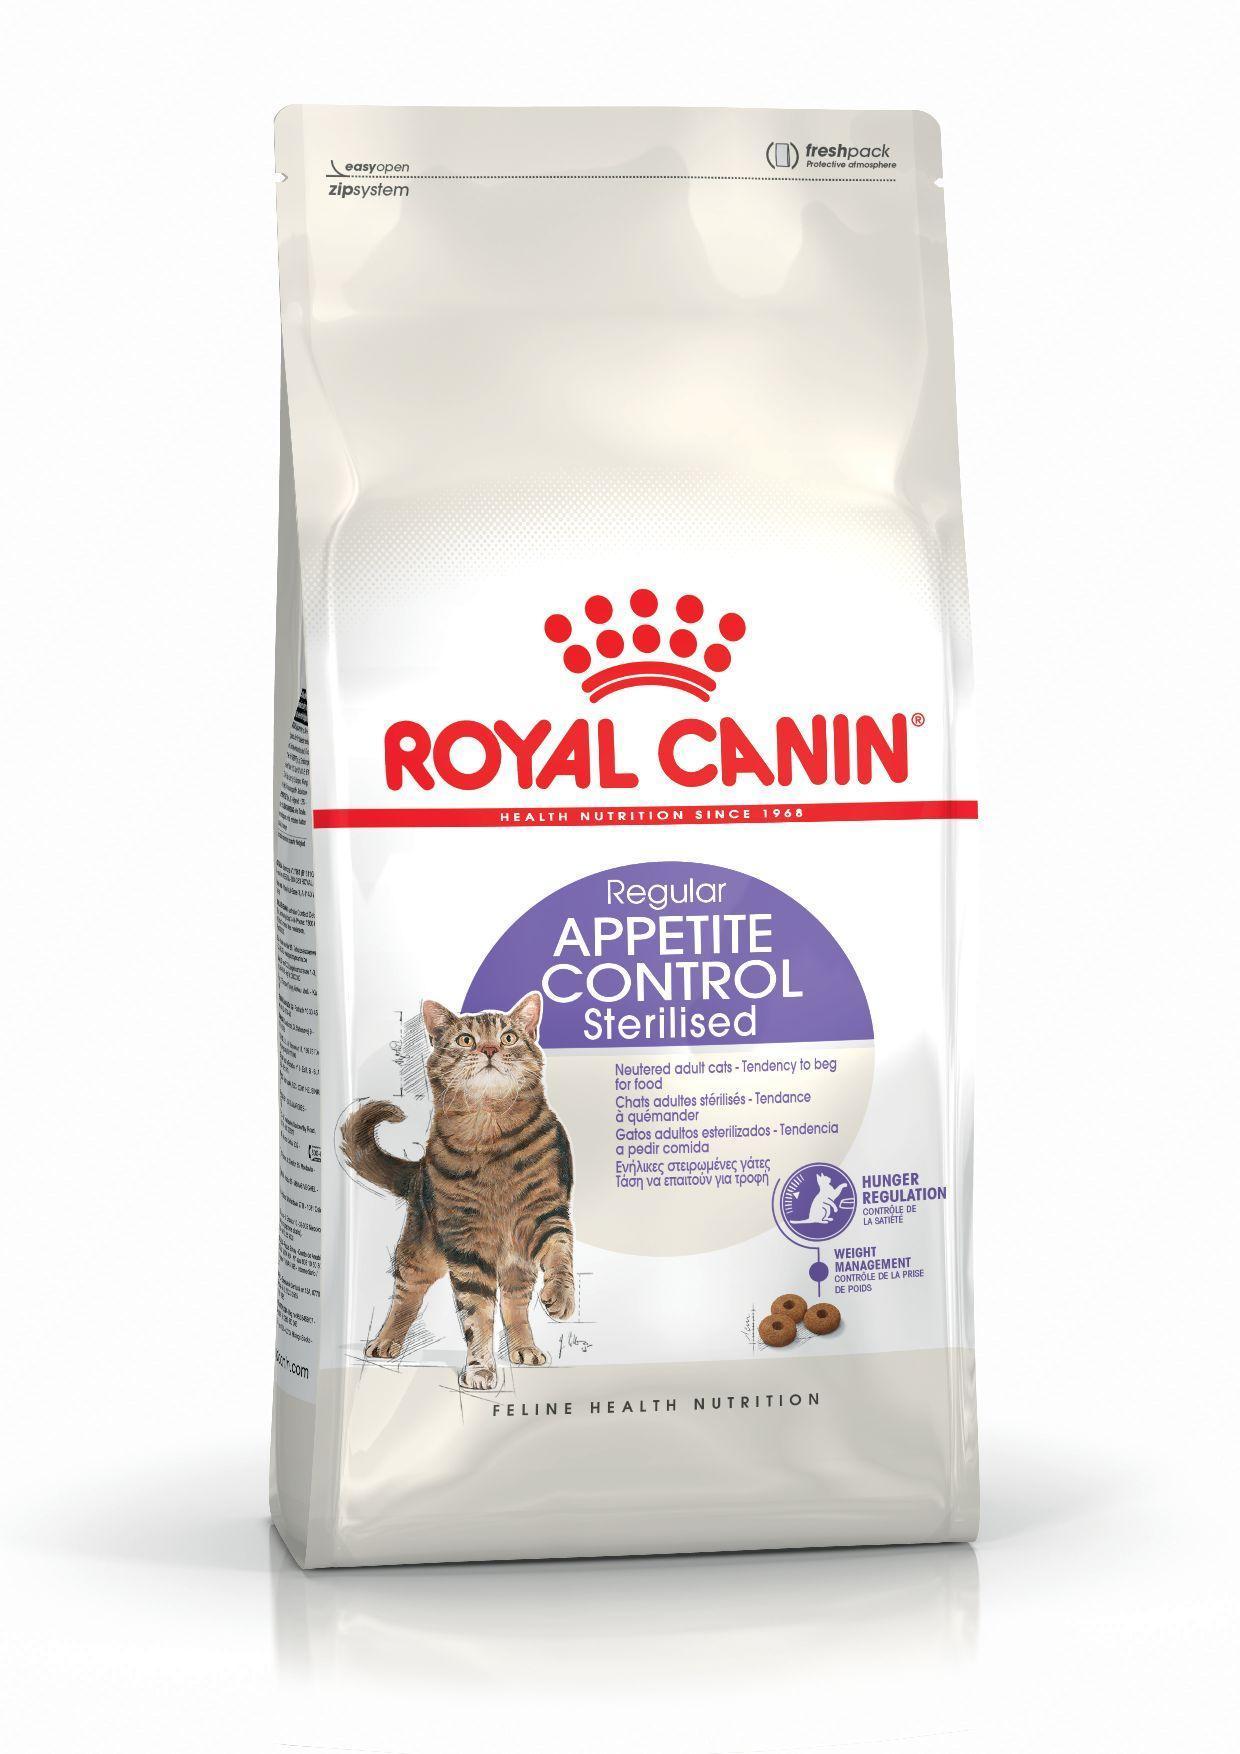 Rpyal Canin Sterilised Appetitive Control